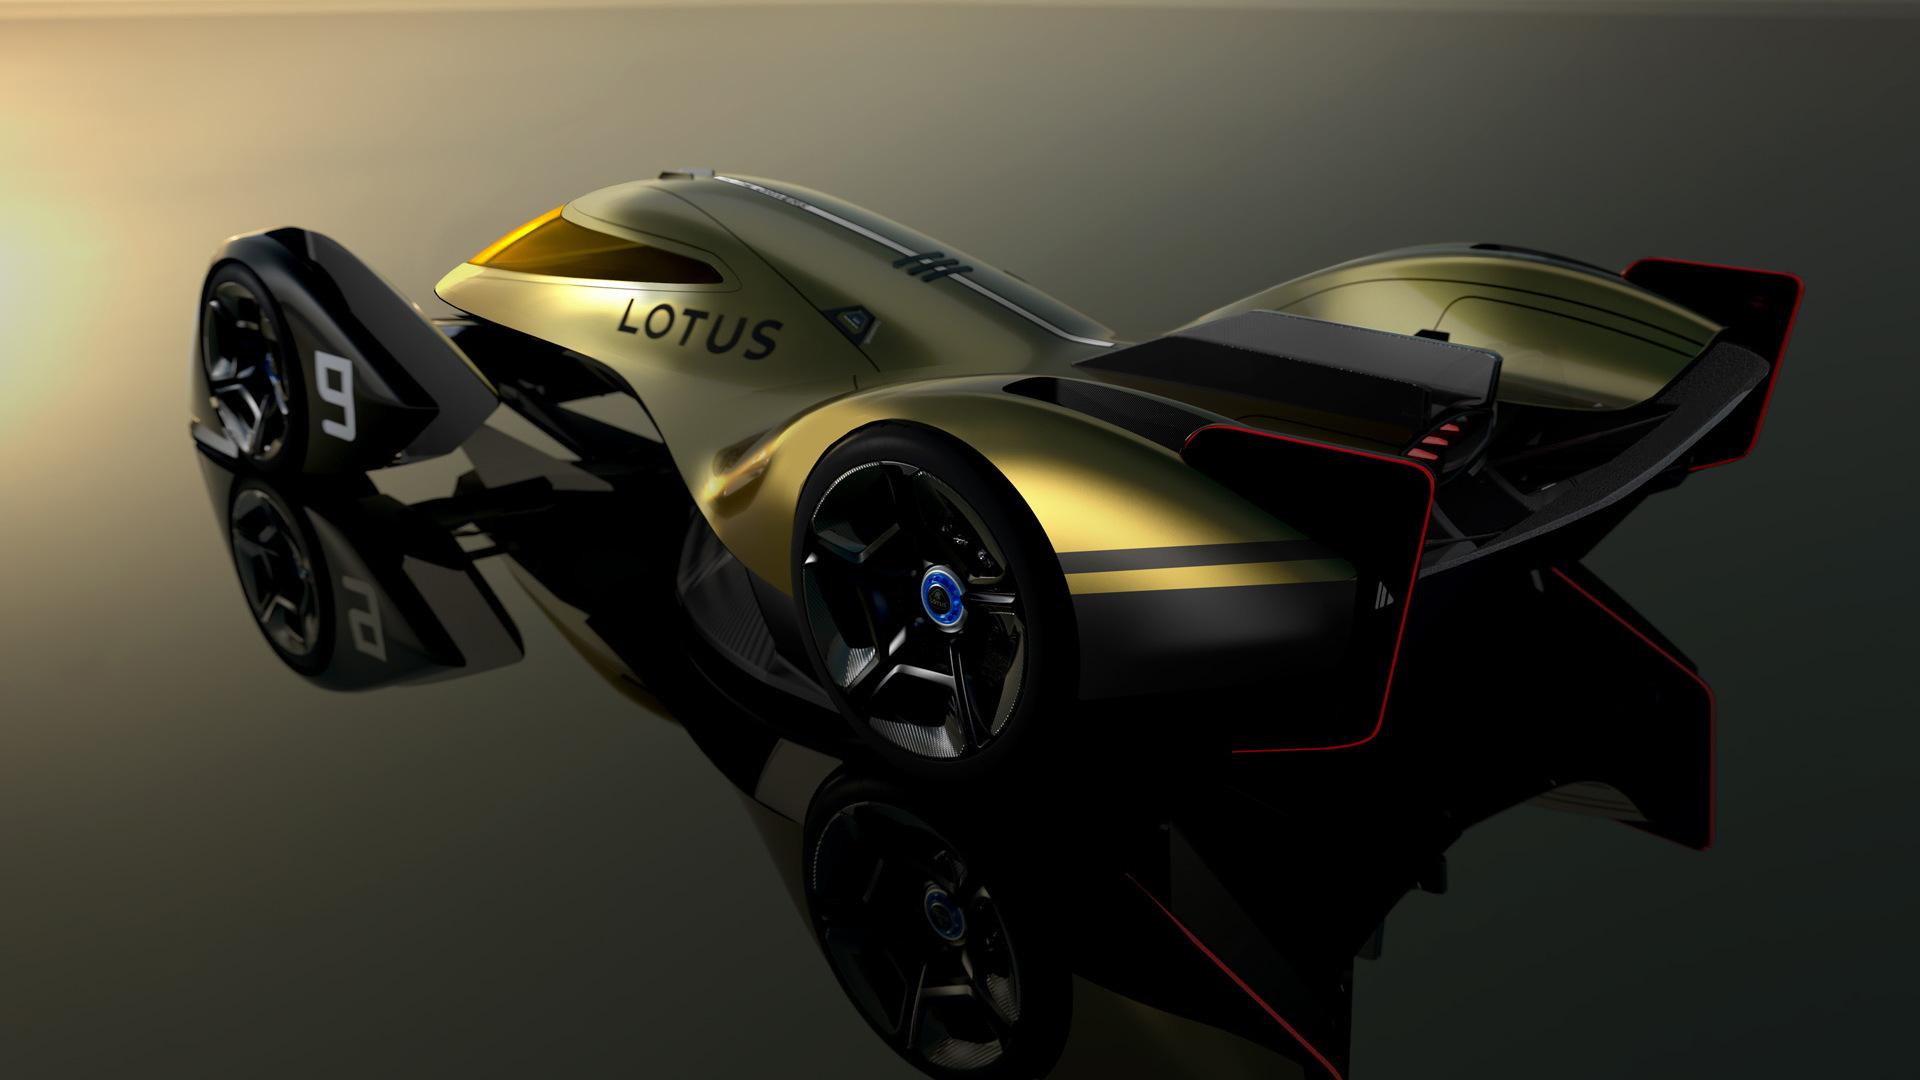 Lotus E-R9 endurance race car concept